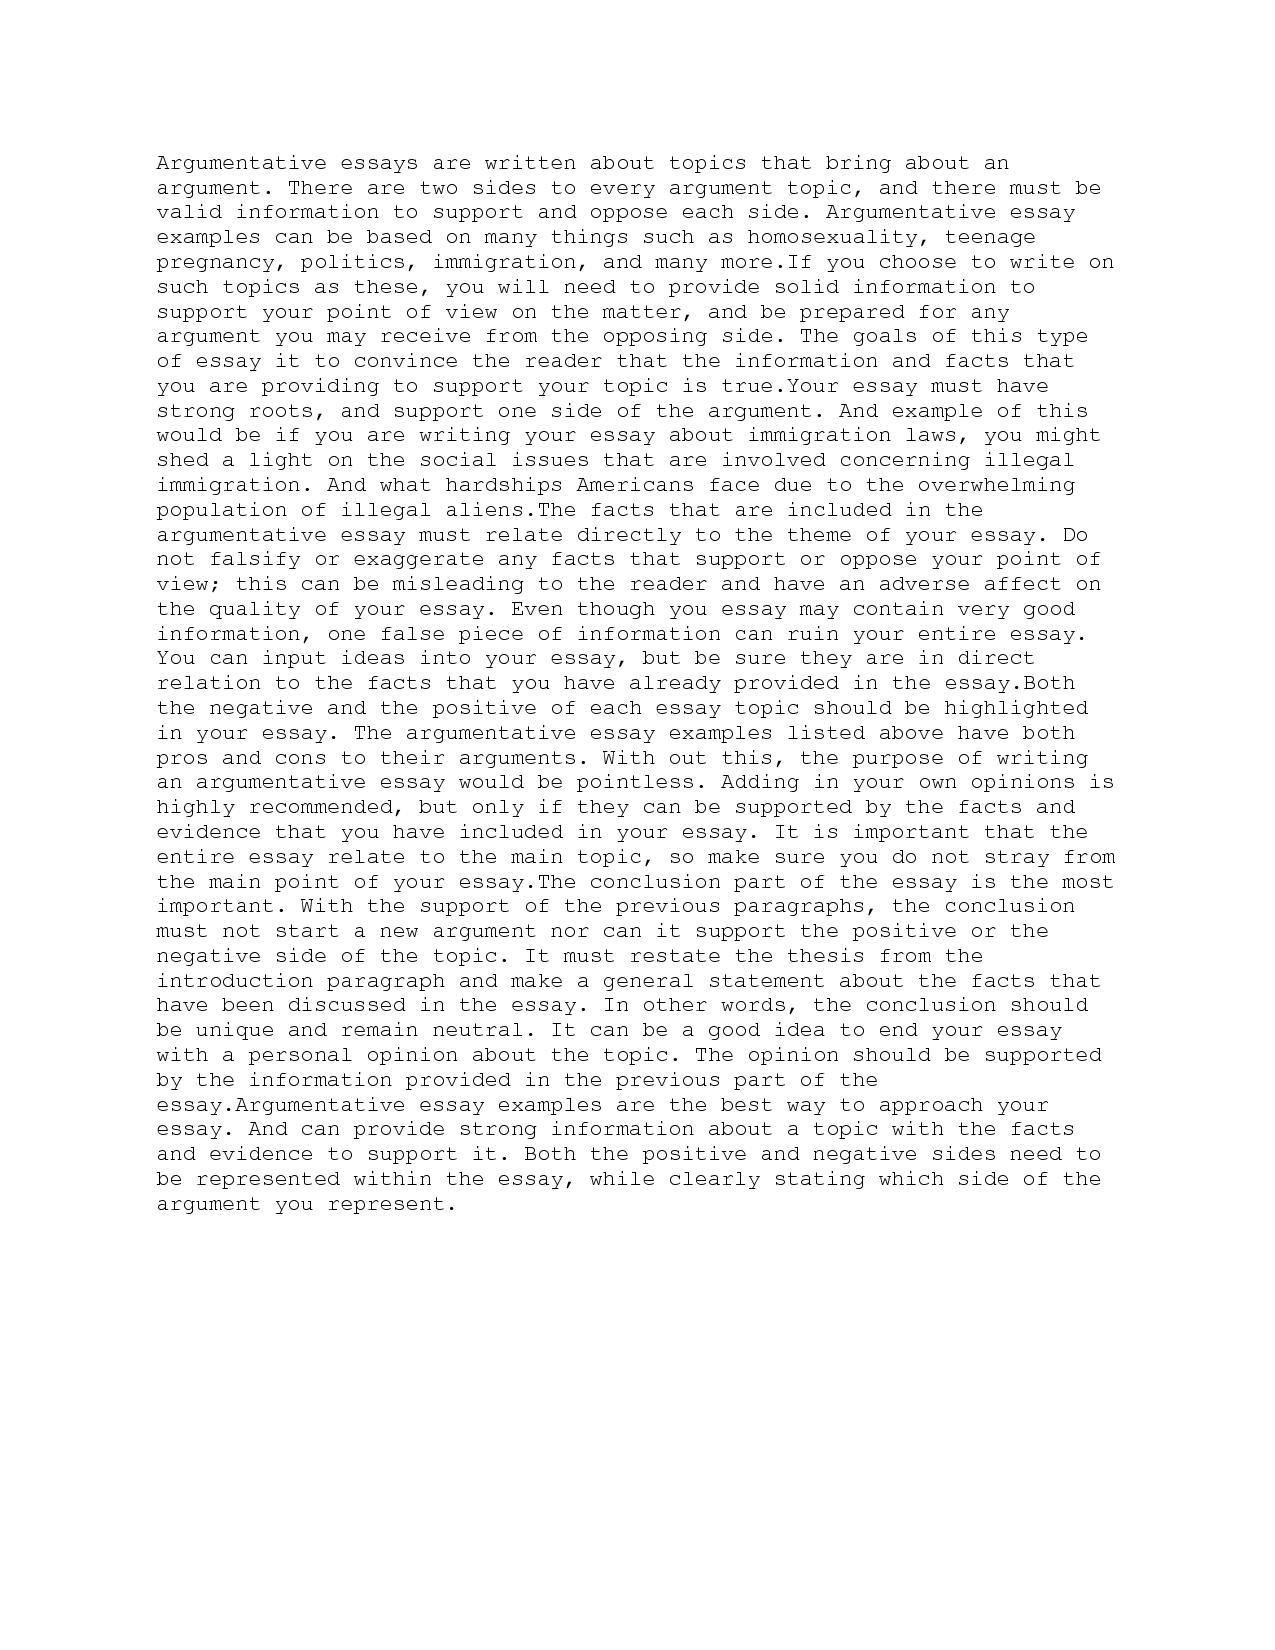 022 Qv3jjq5wkt Best Persuasive Essay Topics Beautiful Uk Argumentative For College Full